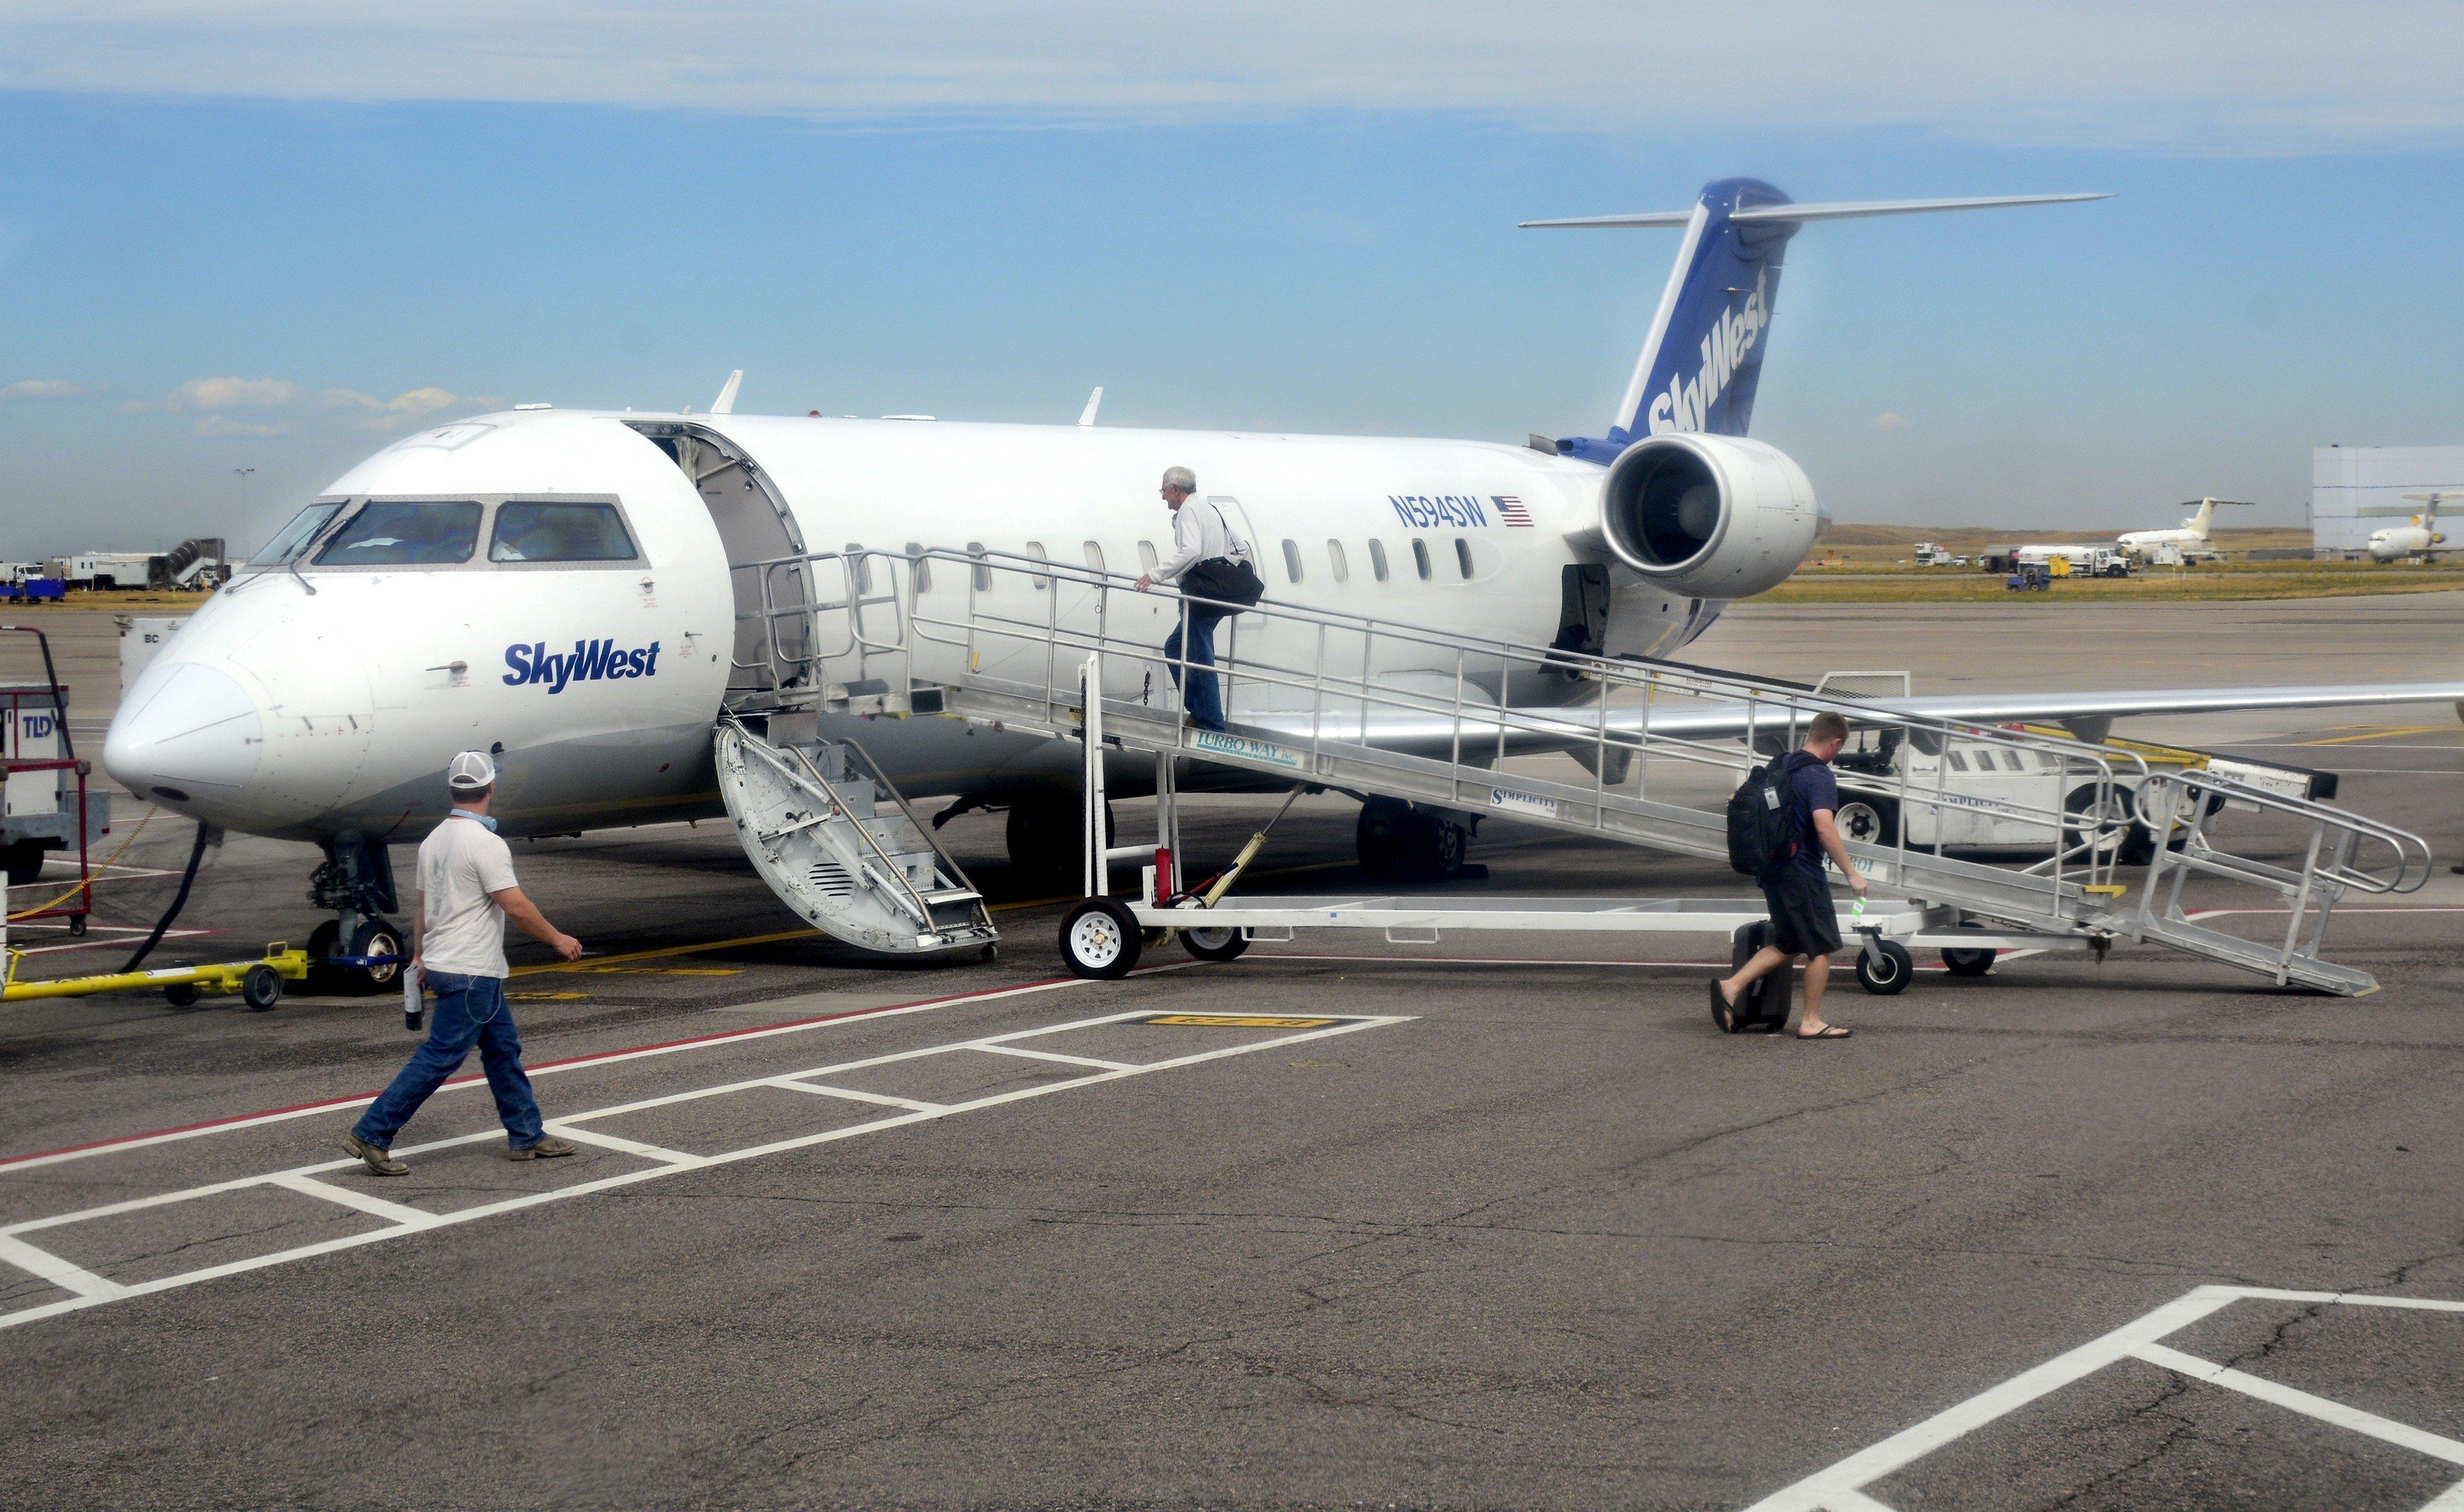 DENVER, CO - September 7, 2016:  Passengers board a SkyWest Airlines Bombardier CRJ-100 passenger plane at Denver International Airport on September 7, 2016. (Photo by Robert Alexander/Getty Images)